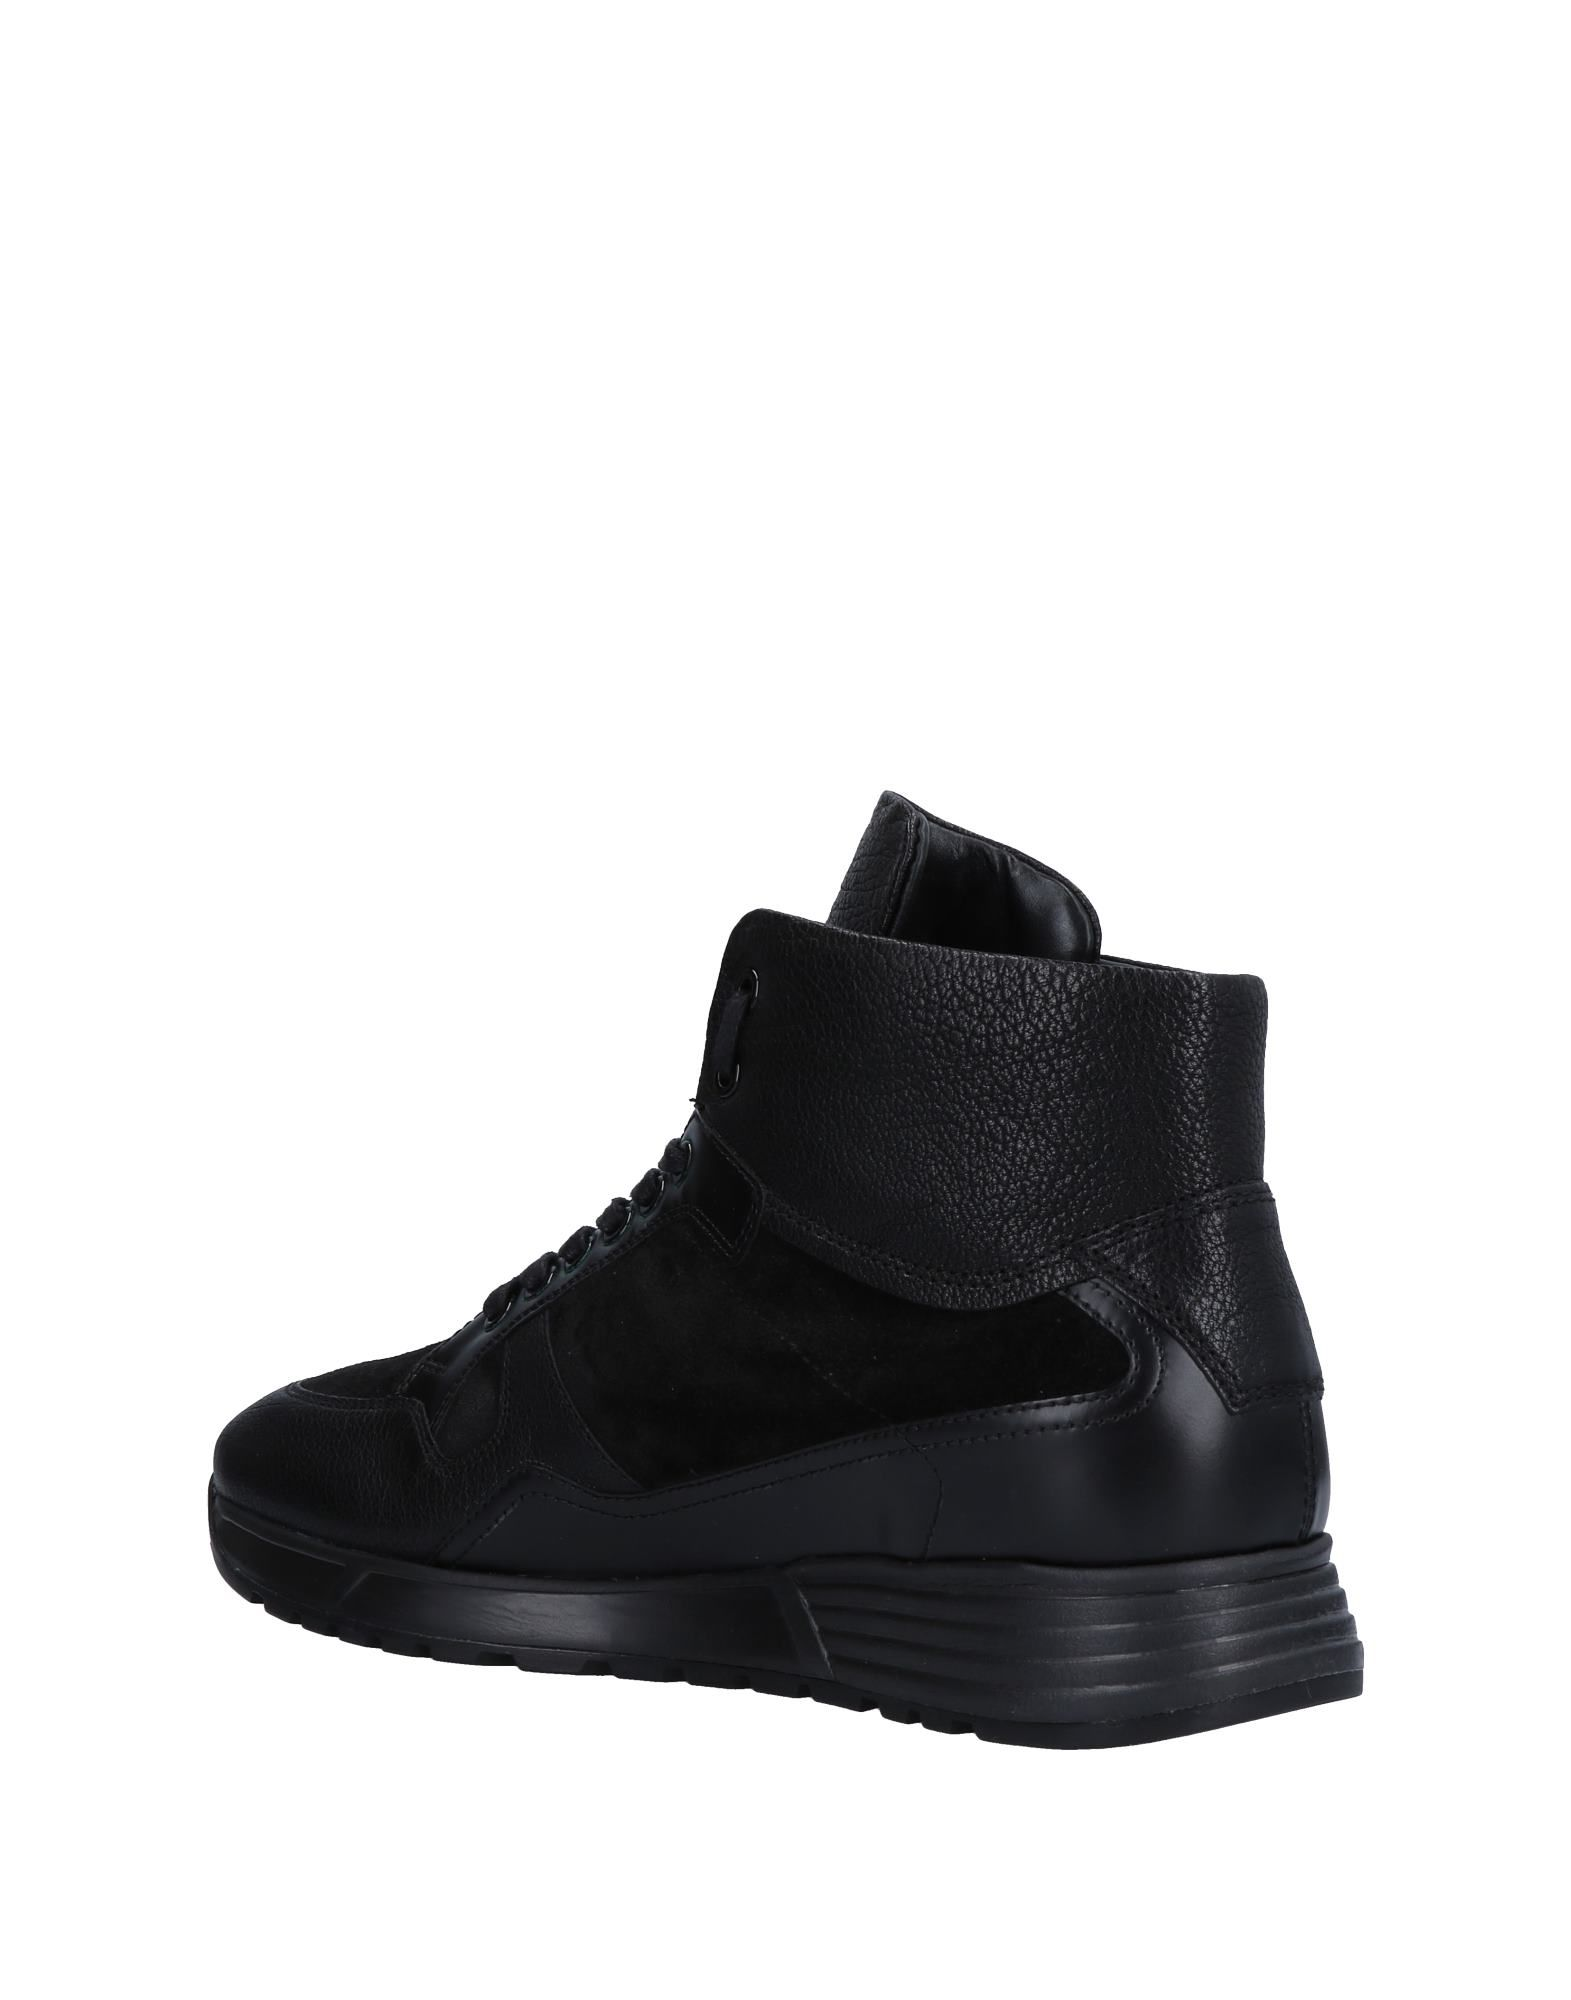 Armani Collezioni Sneakers Herren  11519541RJ Gute Qualität beliebte Schuhe